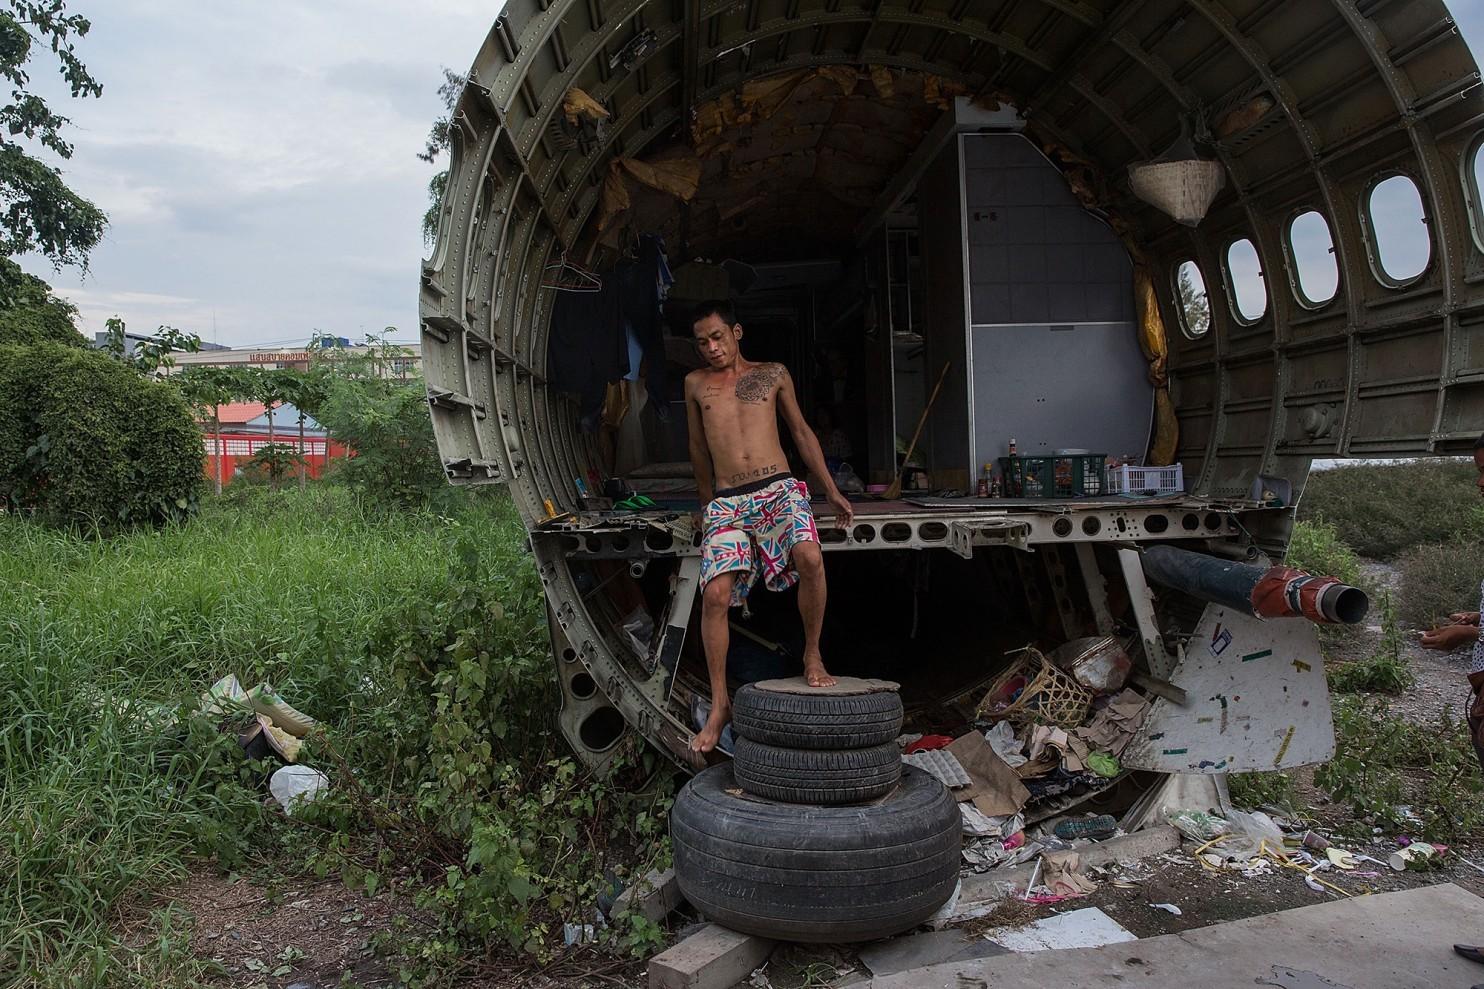 bangkok-airplanes-home-01